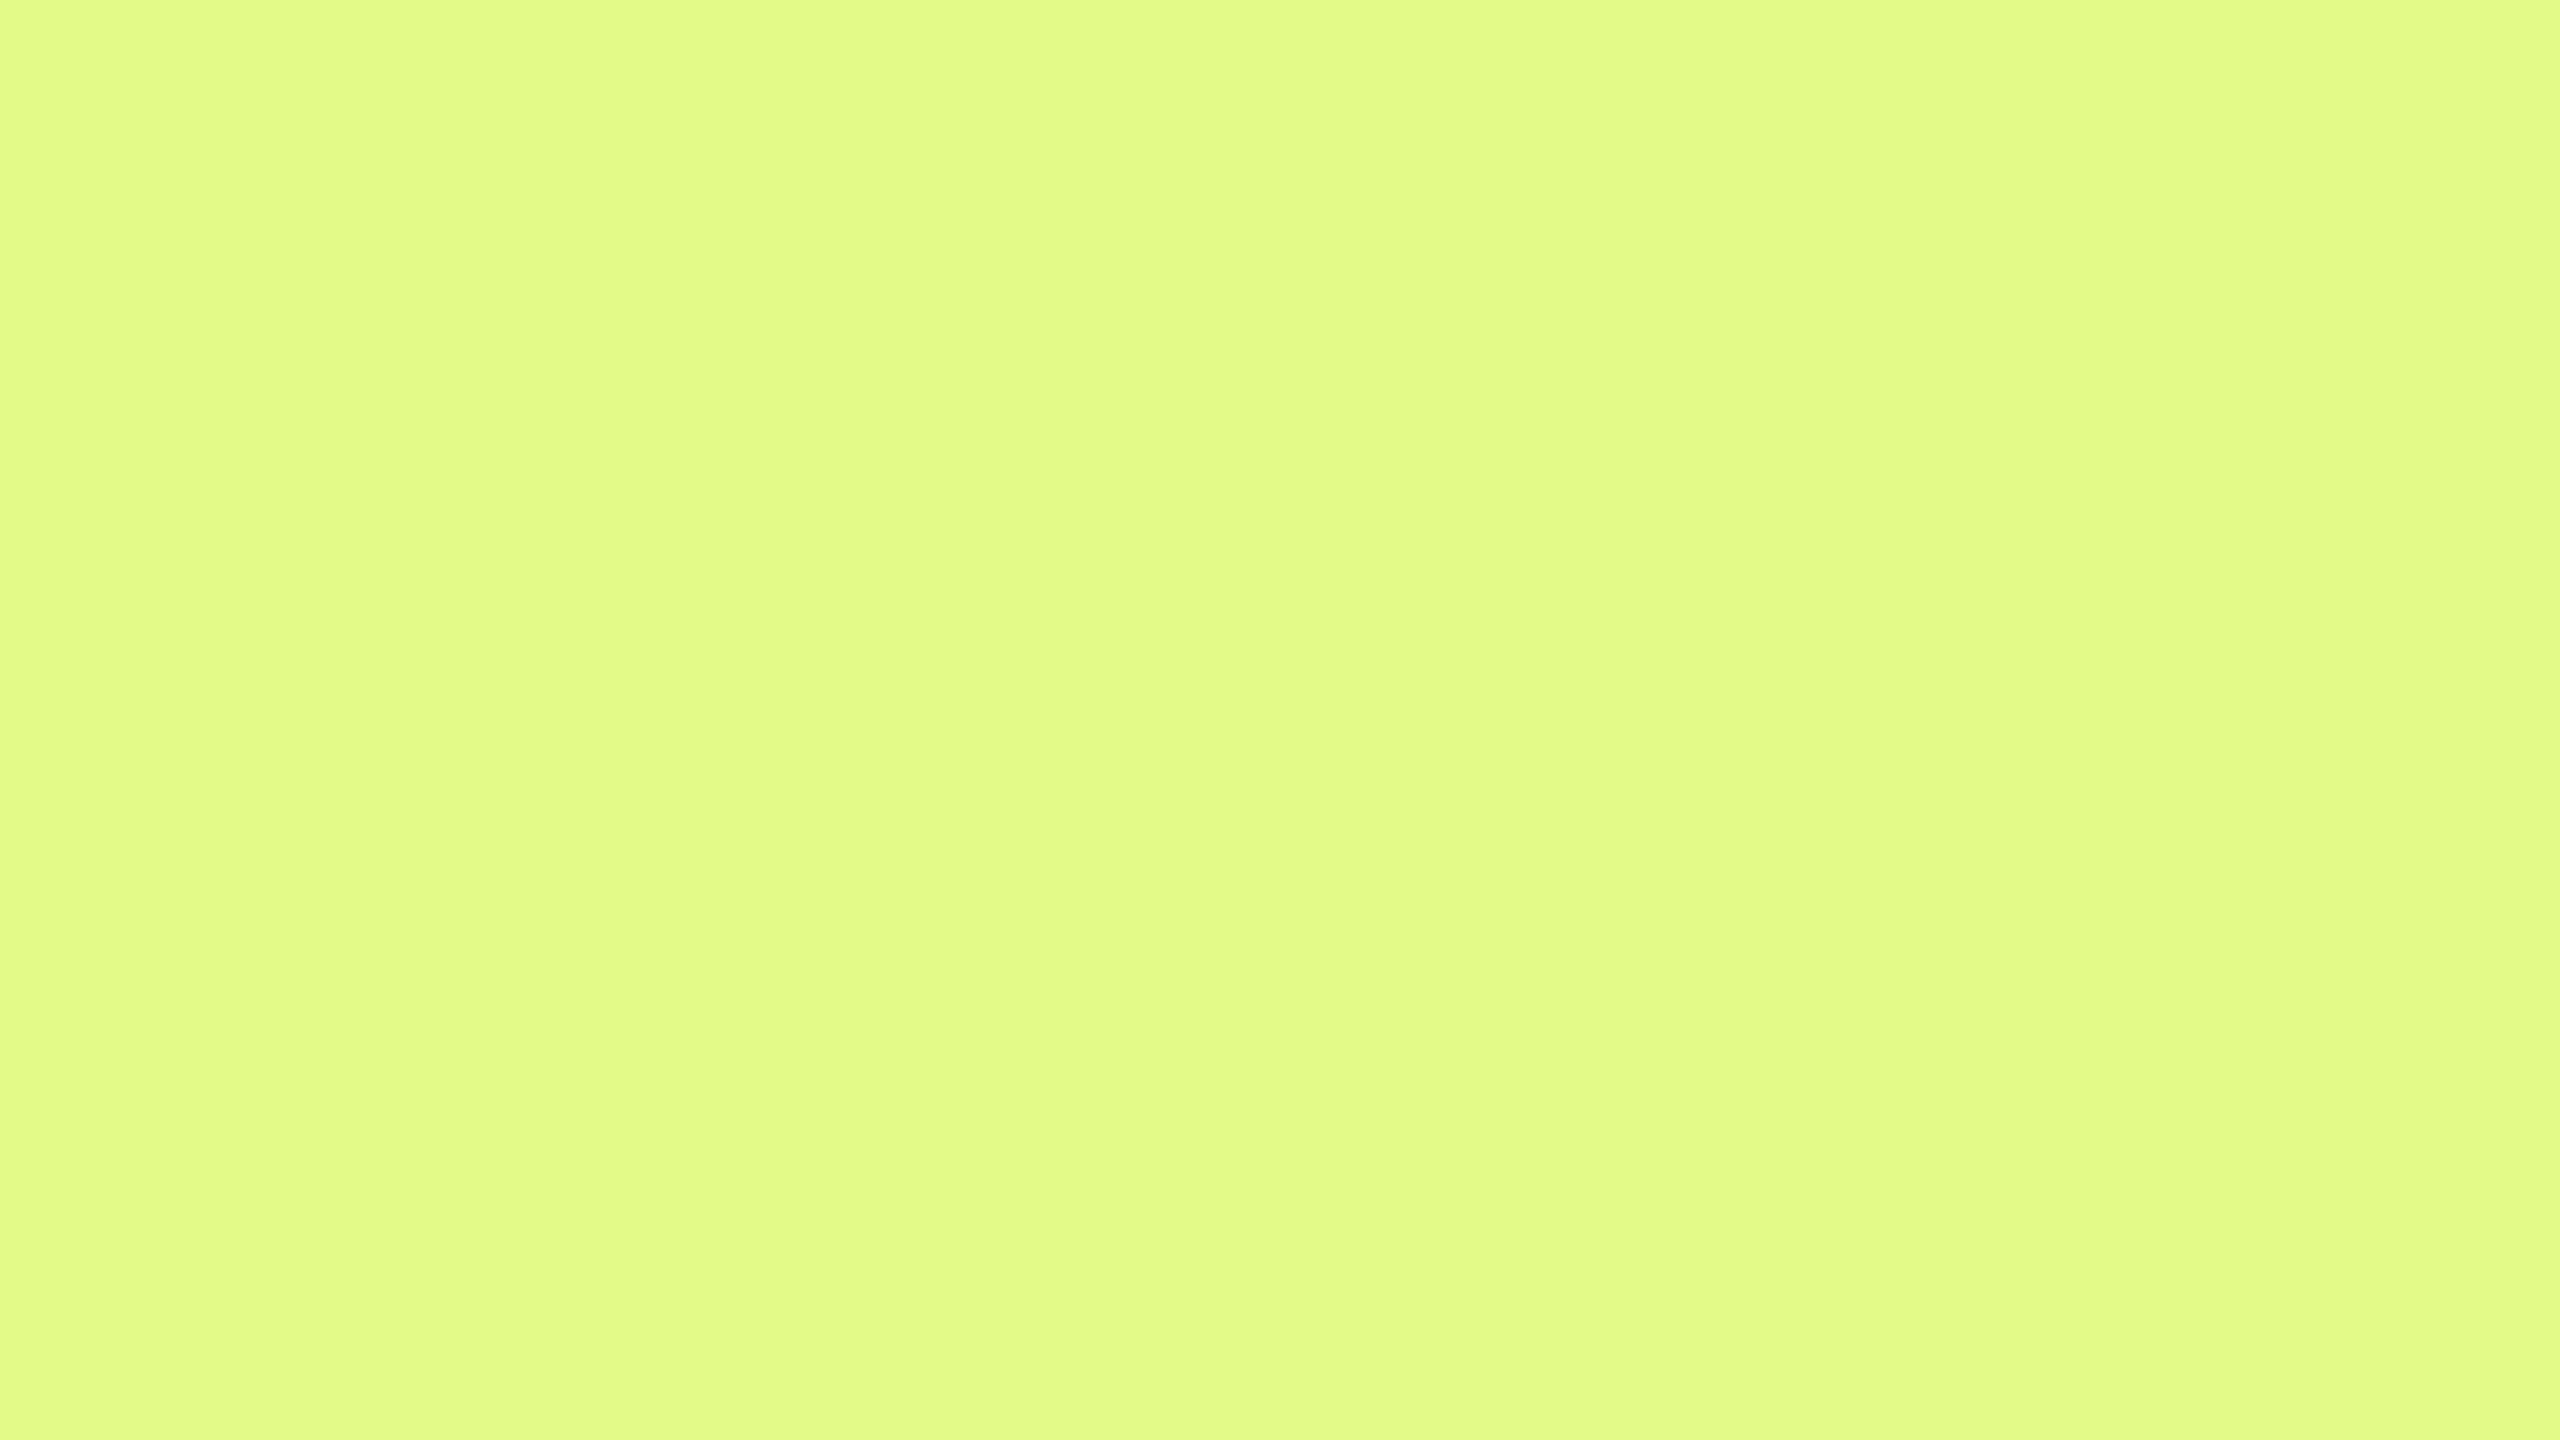 2560x1440 Midori Solid Color Background